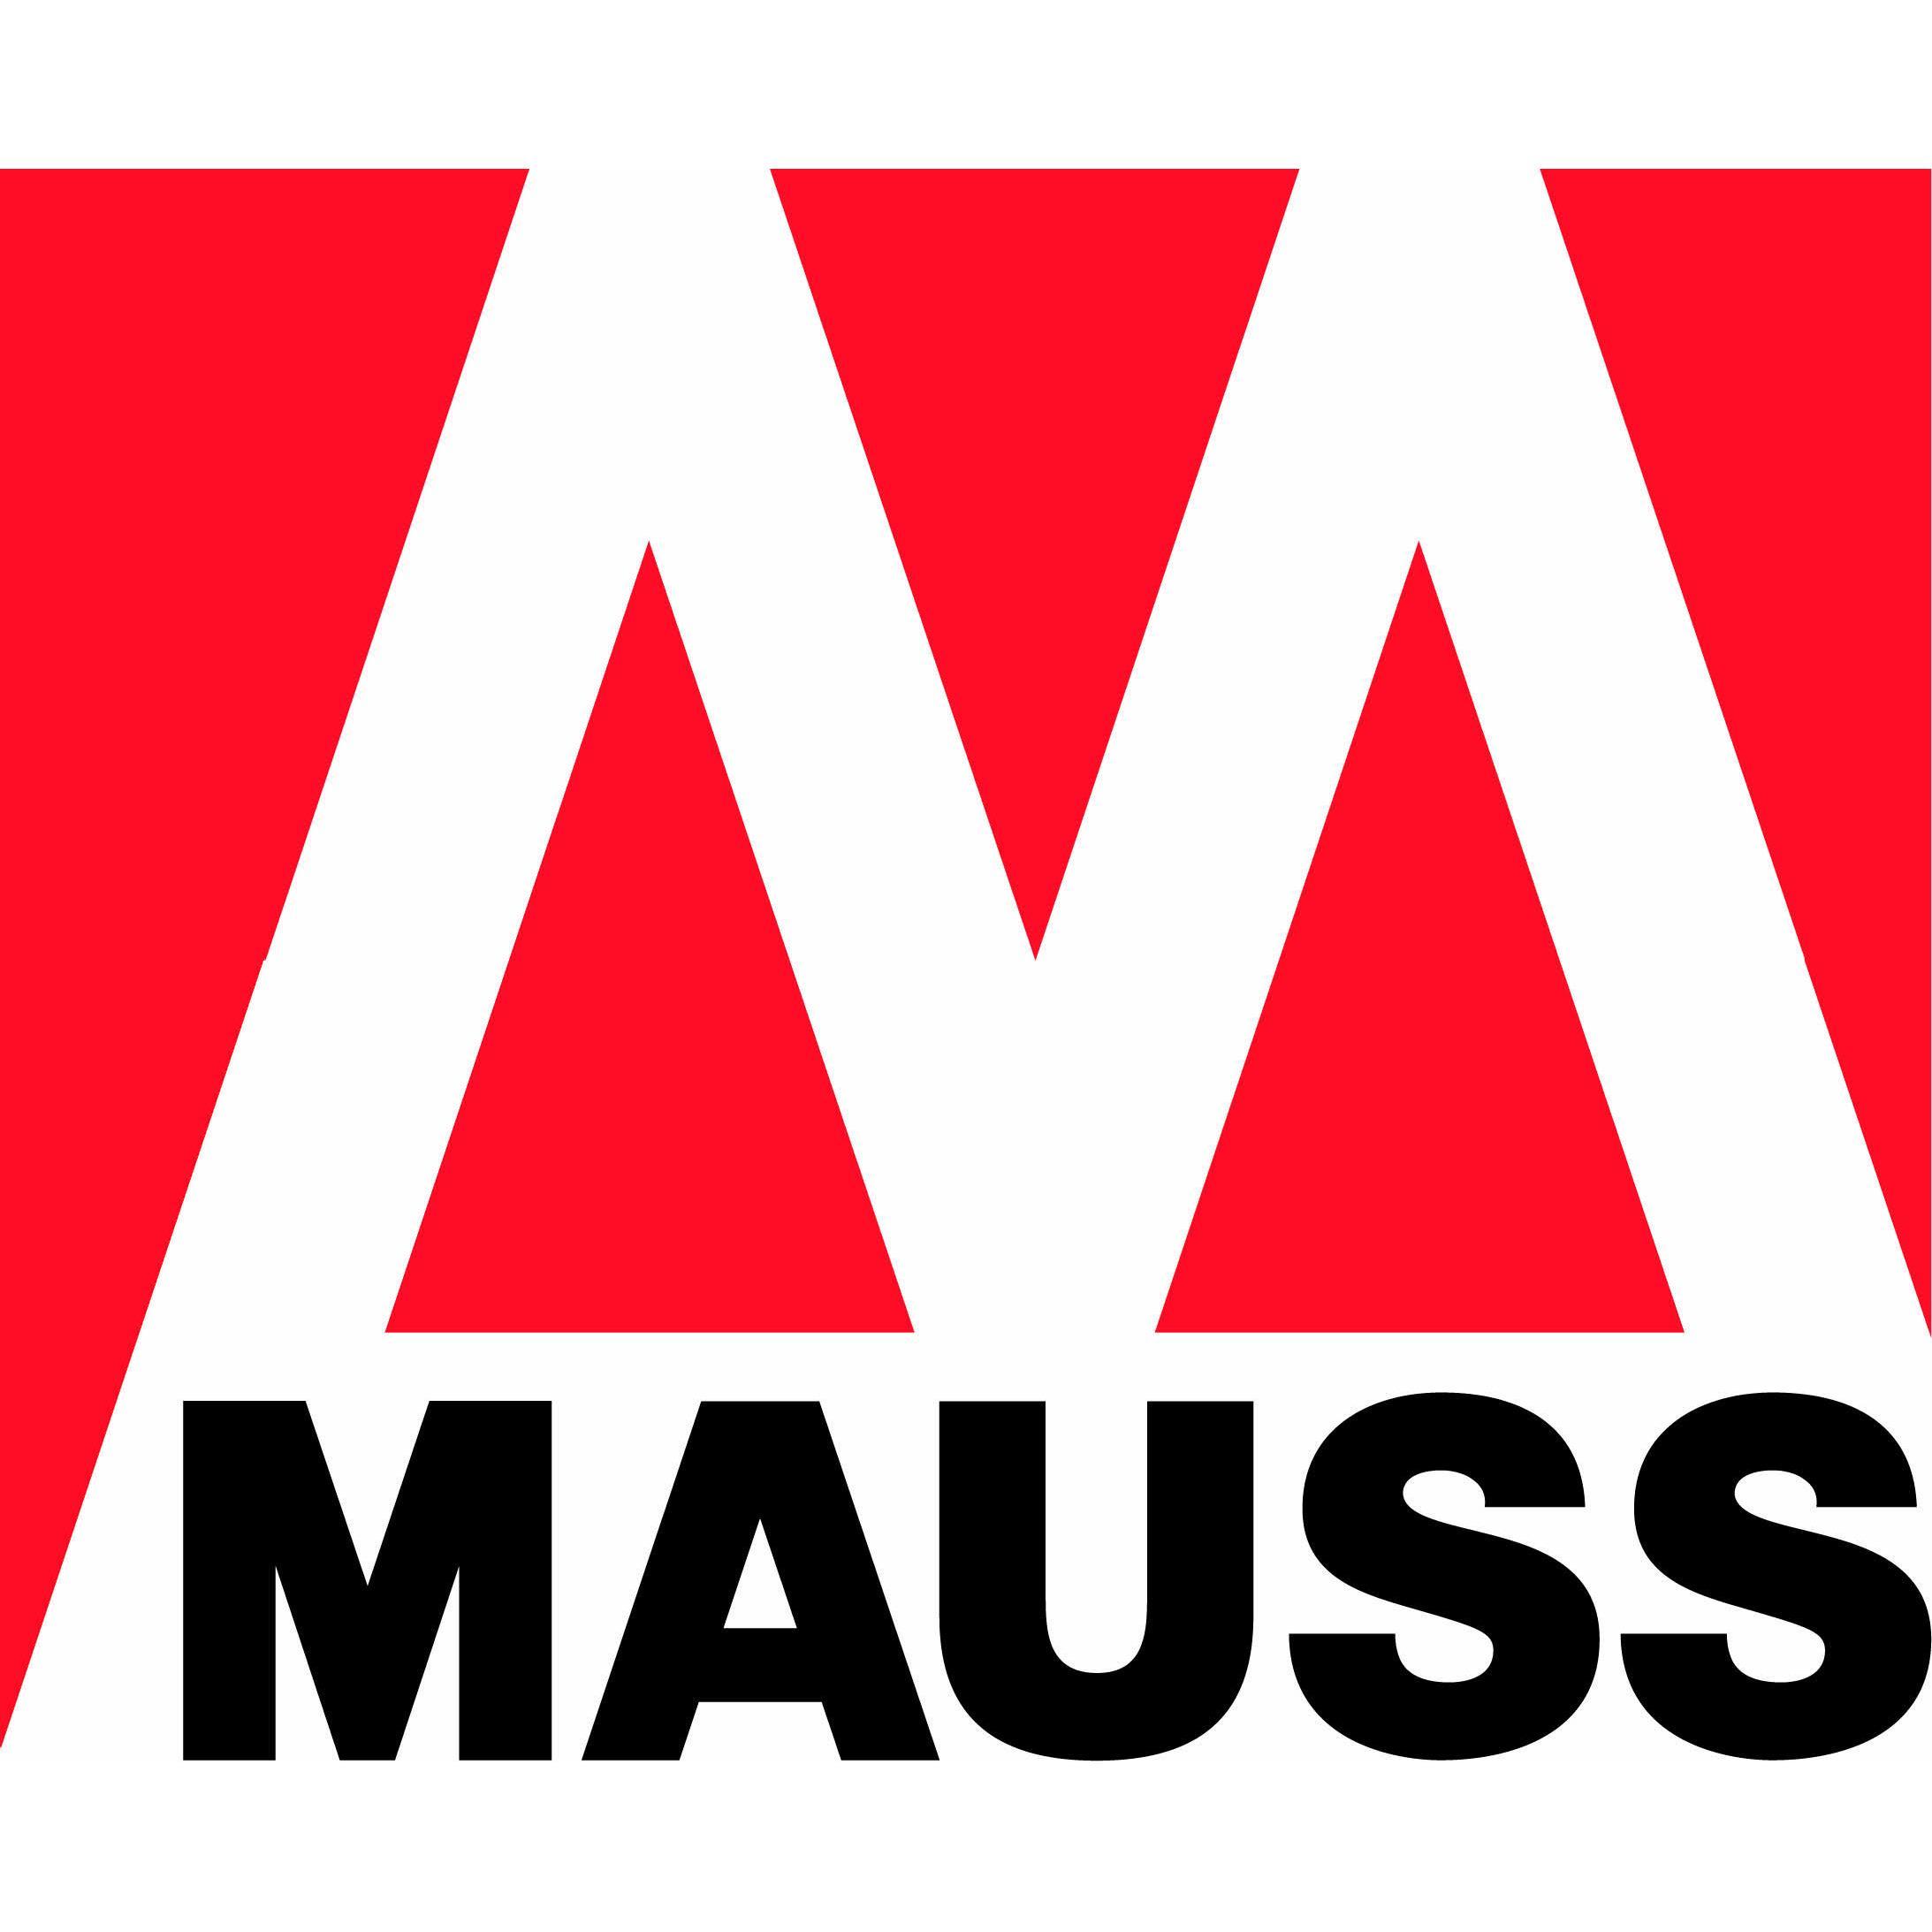 MAUSS Spezialbau GmbH & Co. KG